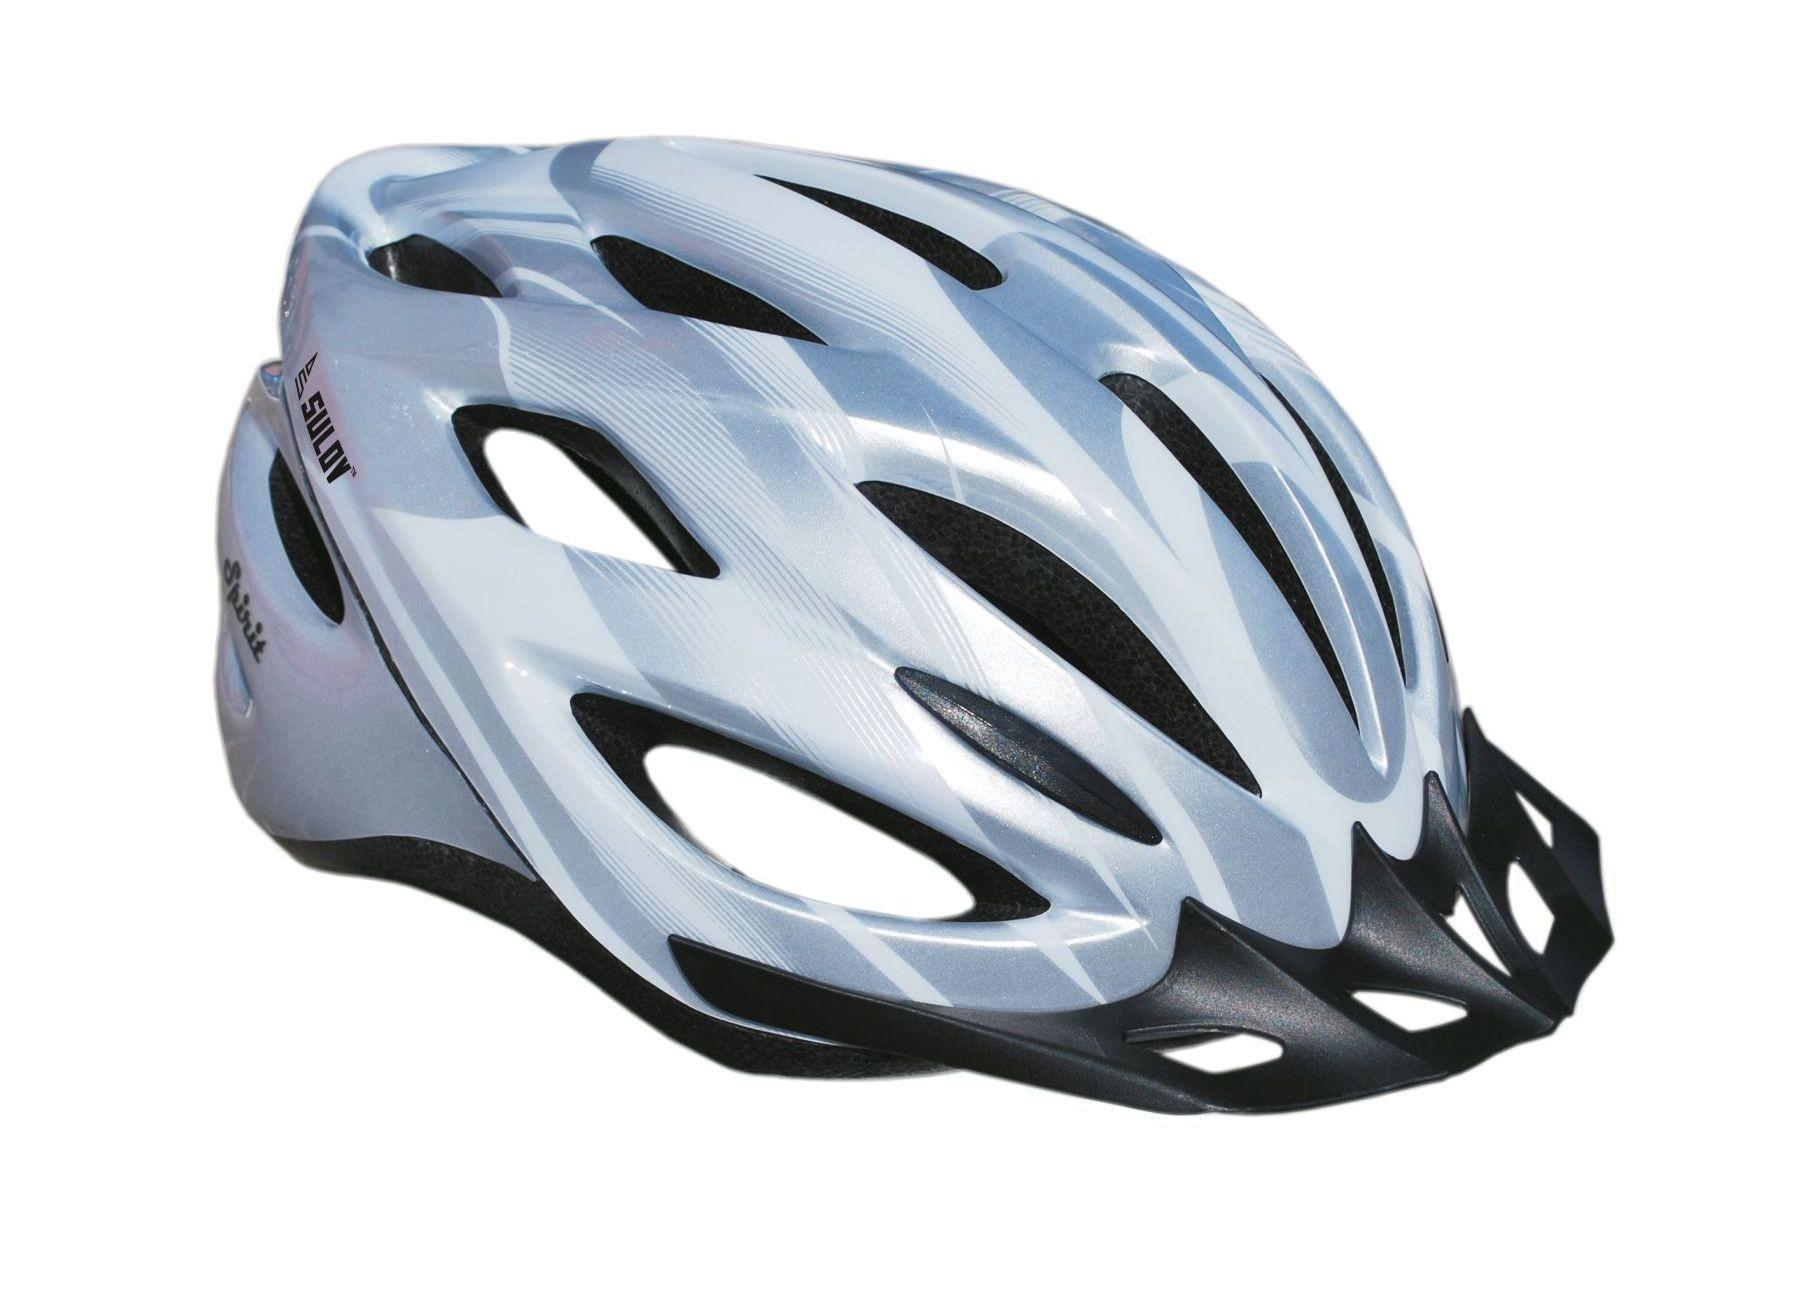 Cyklo helma SULOV SPIRIT, vel. S, stříbrná